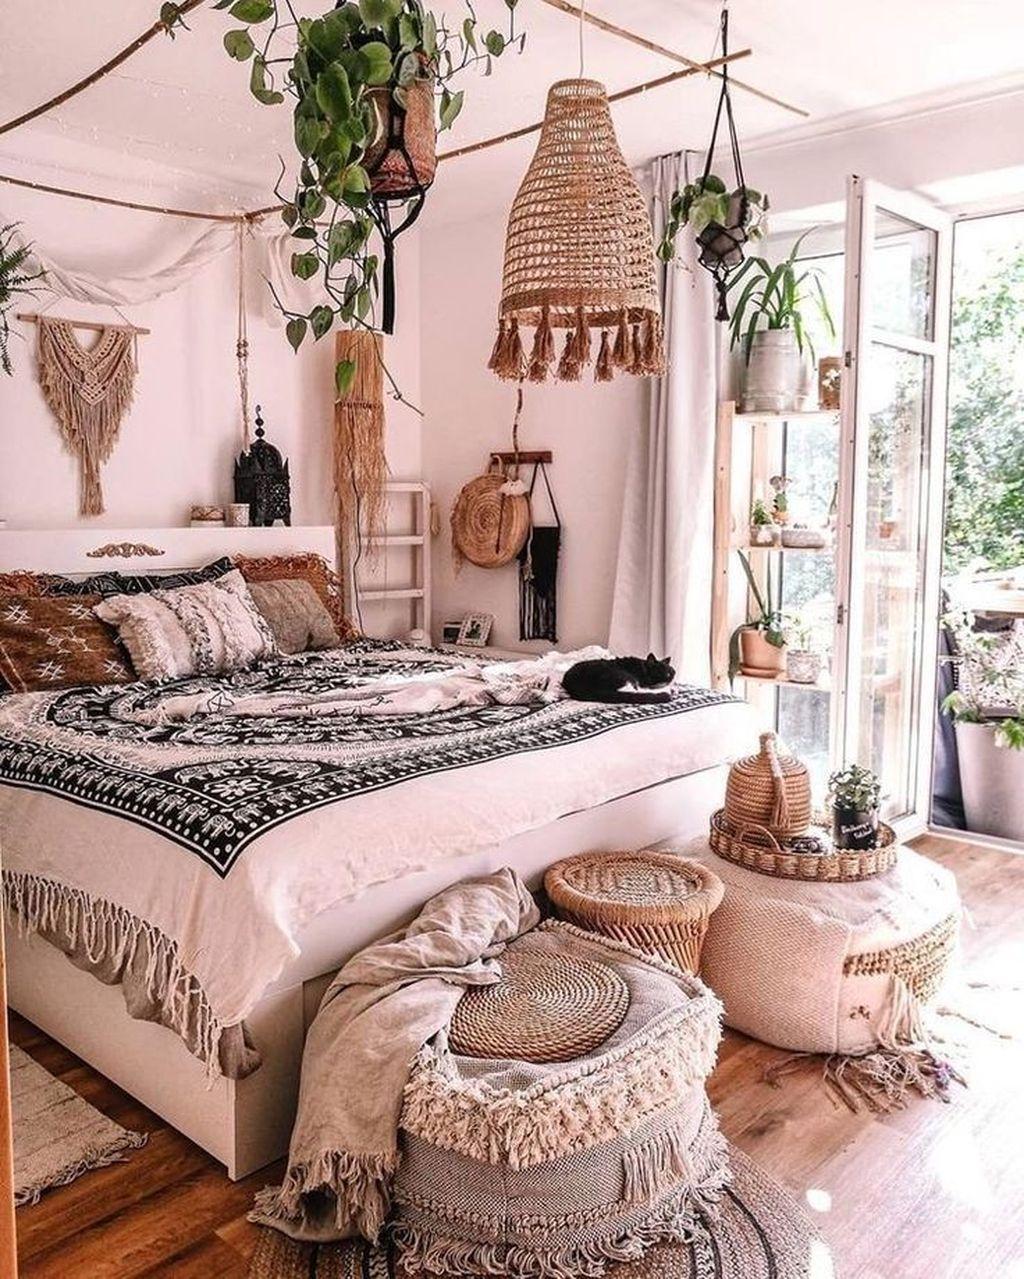 Awesome Boho Chic Bedroom Decor Ideas 21